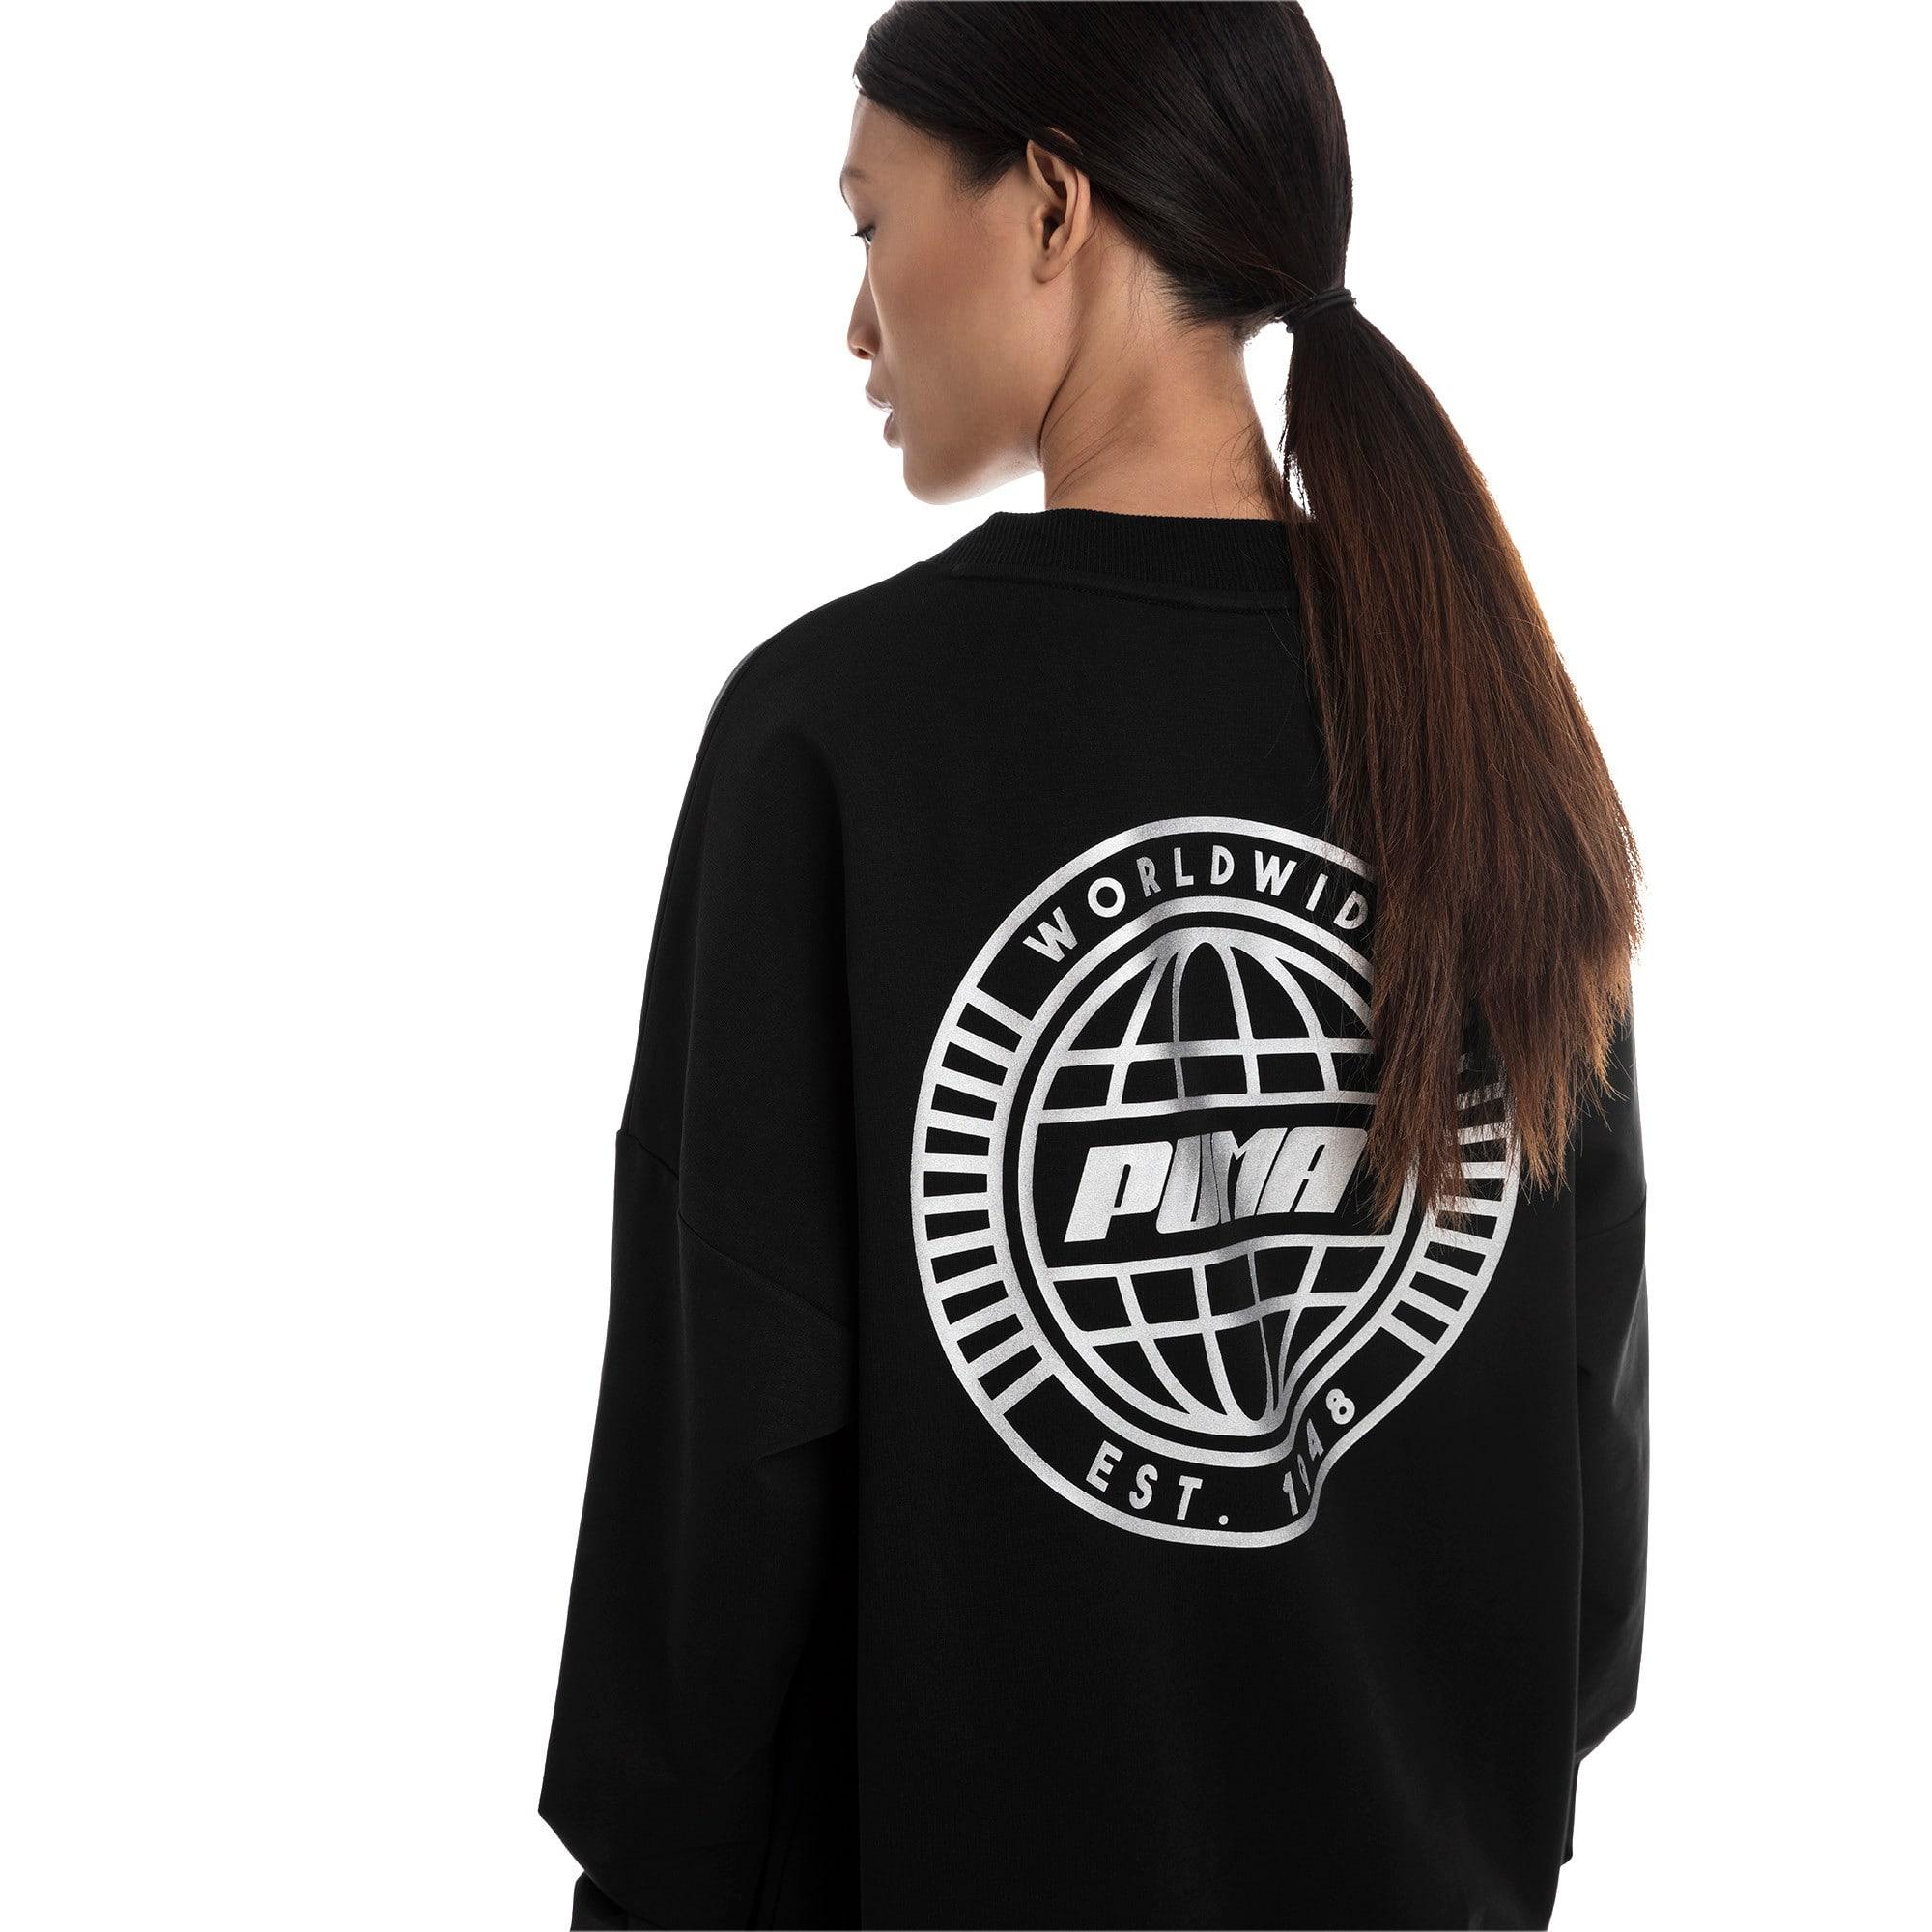 Thumbnail 2 of Trailblazer Women's Long Crewneck Sweatshirt, Cotton Black, medium